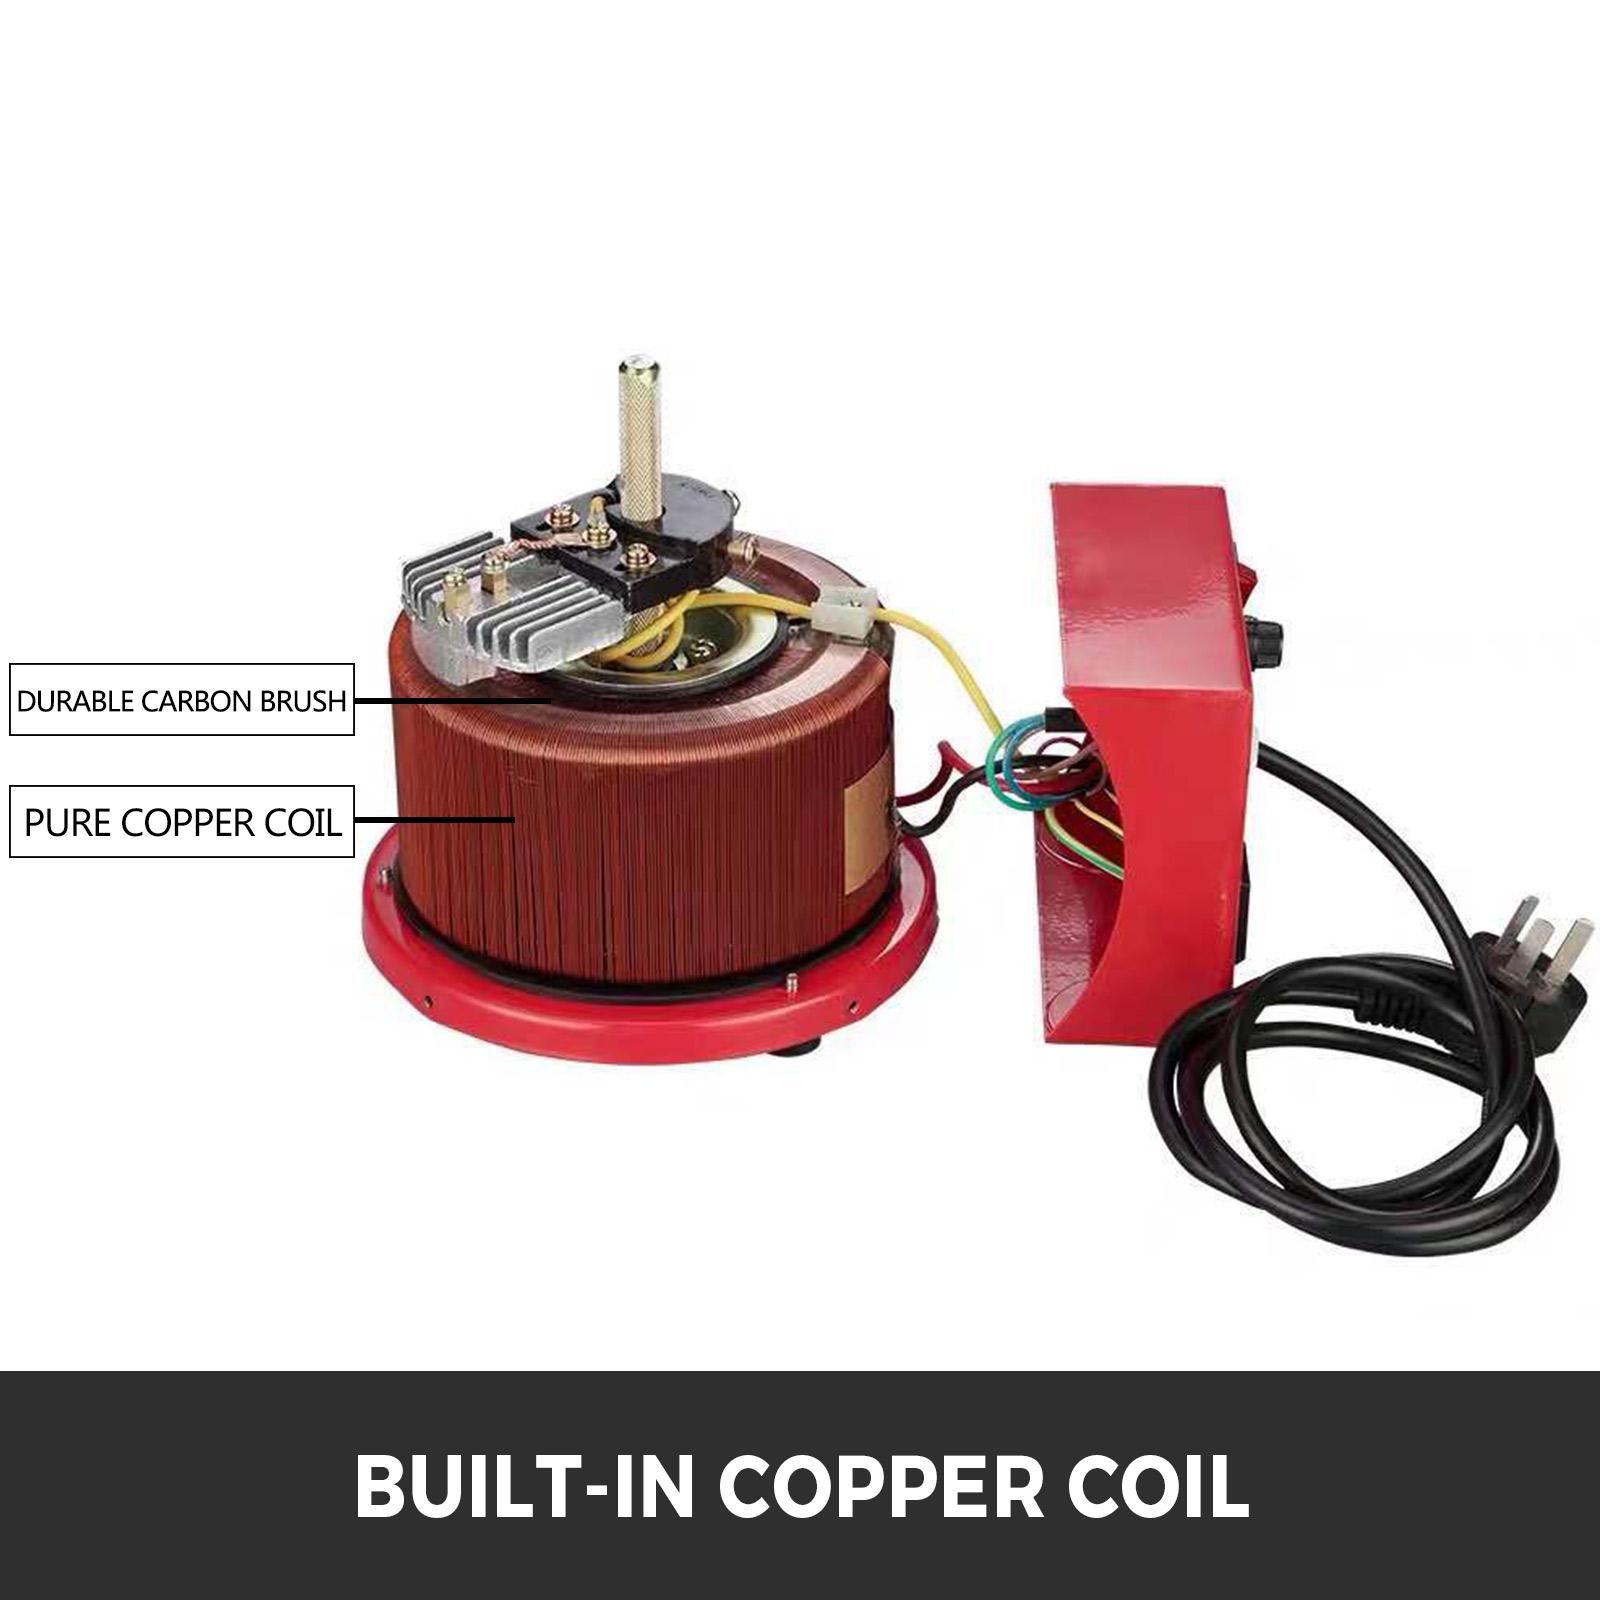 Auto-Variac-Variable-Transformer-0-5-1-2-3KVA-Regulator-pure-copper-coil-220V thumbnail 14